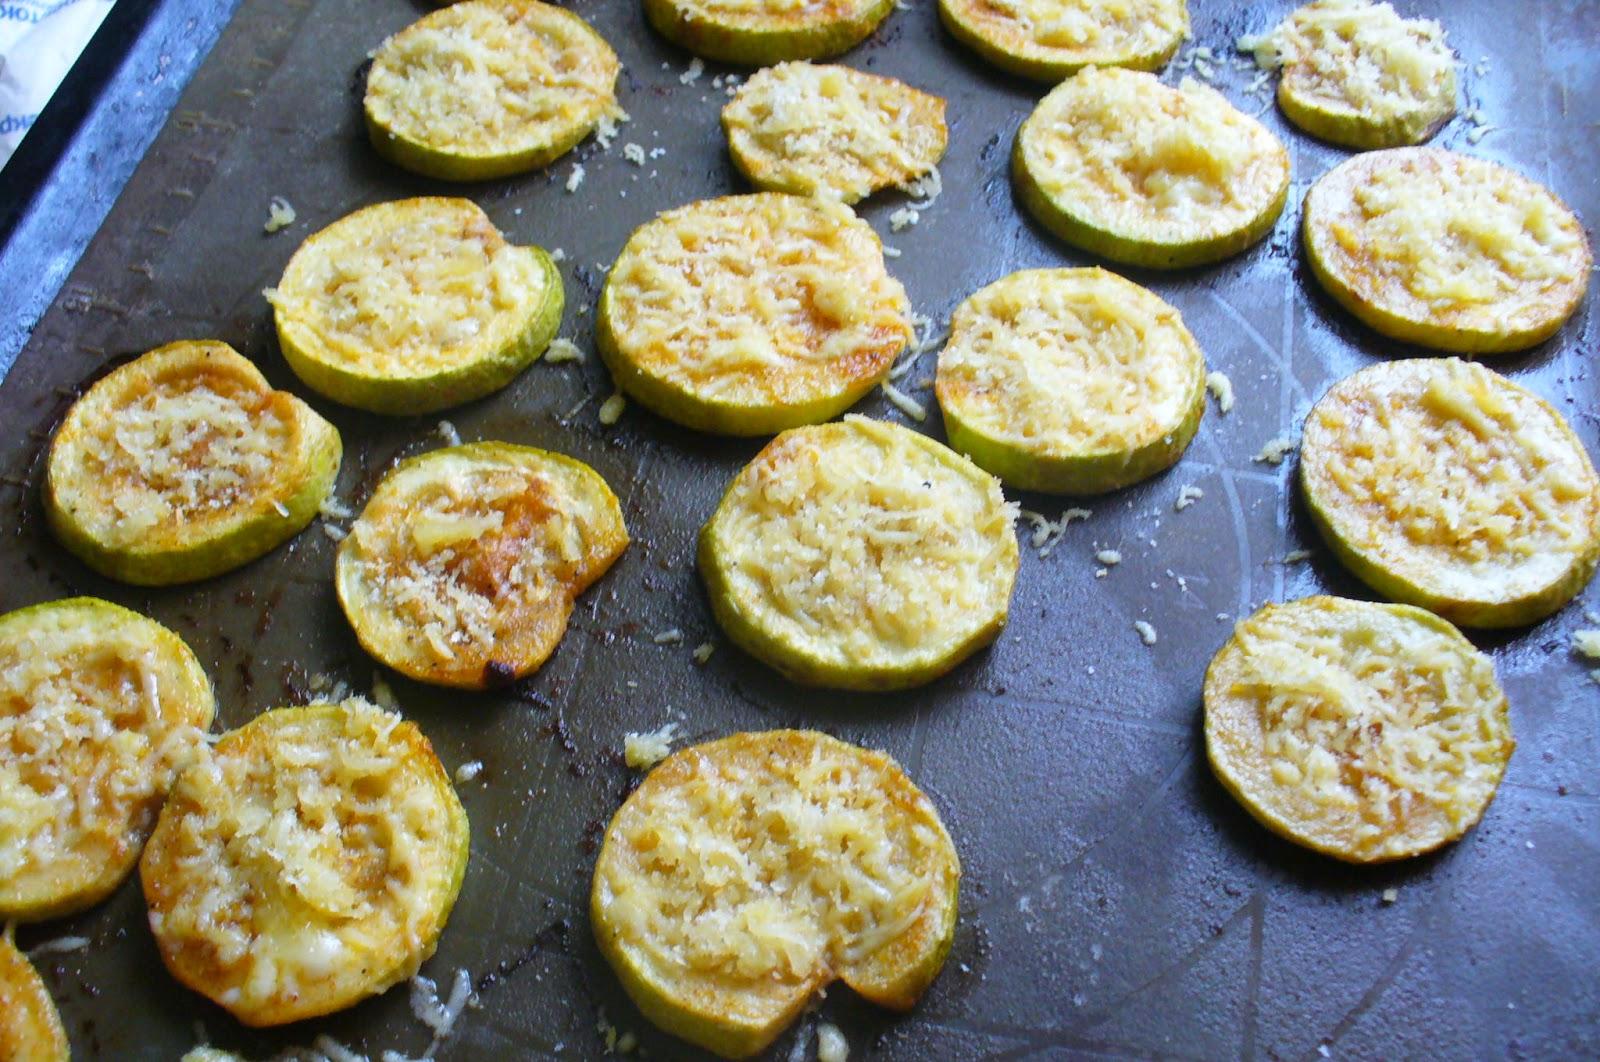 кабачки запеченные с сыром на противне